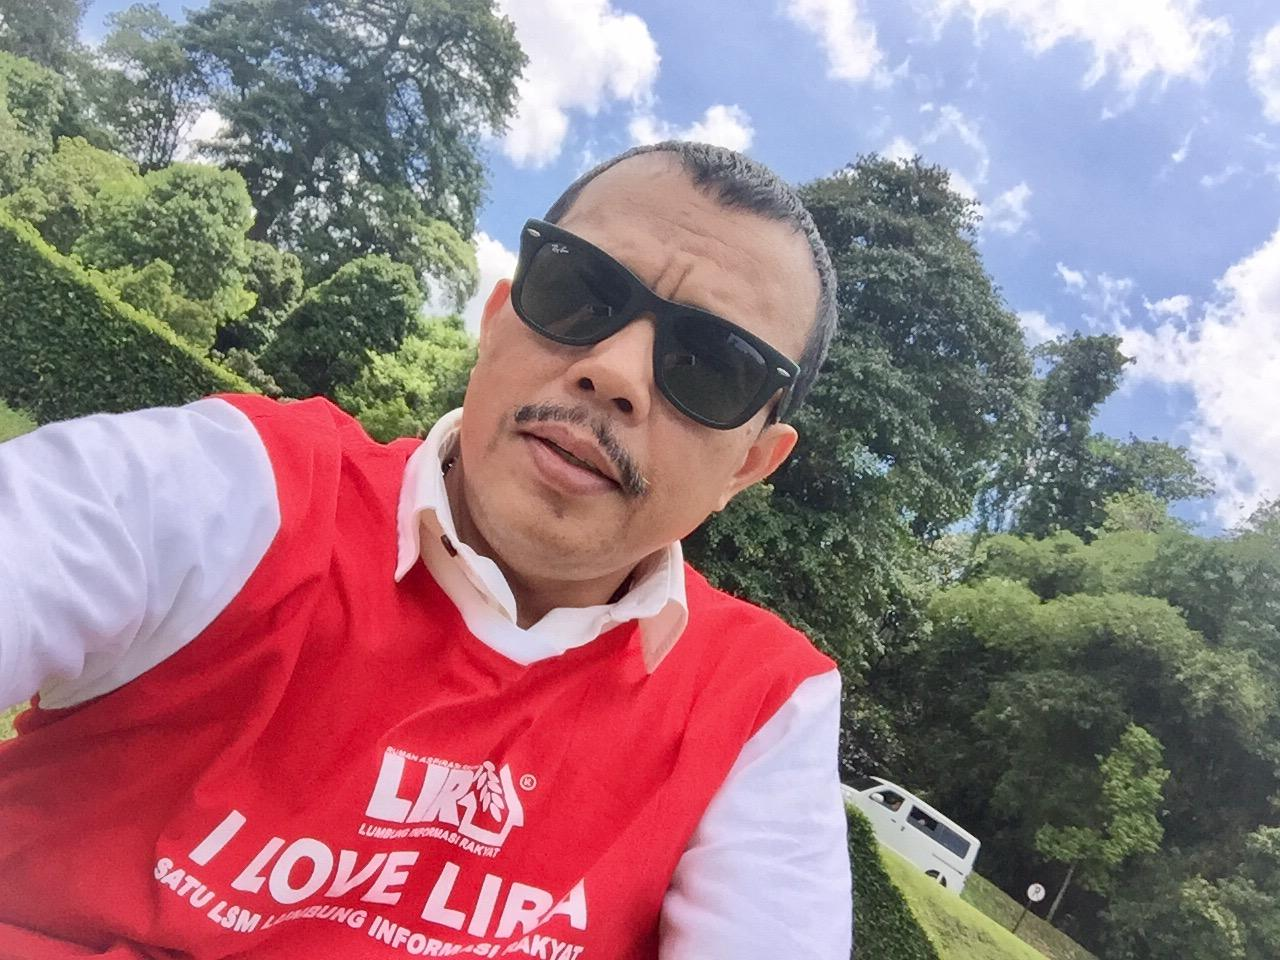 LSM LIRA Desak KPK Umumkan Penetapan Tersangka Cakeda Korup Untuk Pemimpin Bersih